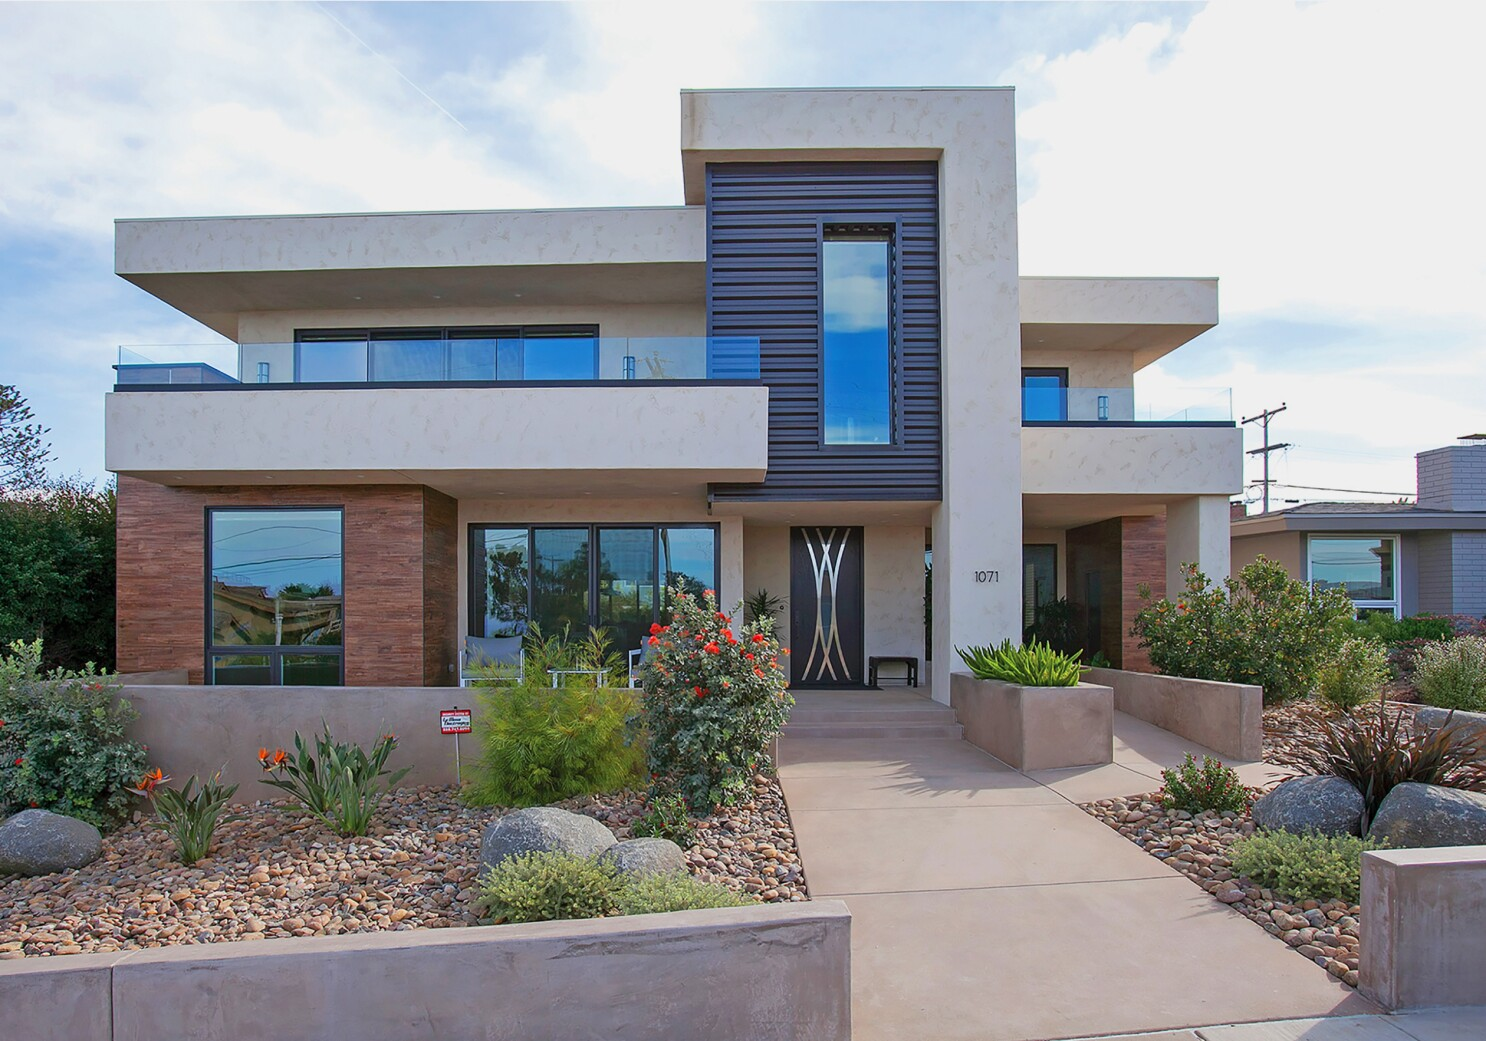 Peek Inside San Diego S Most Enviable Homes At Modern Home Tour Oct 12 La Jolla Light